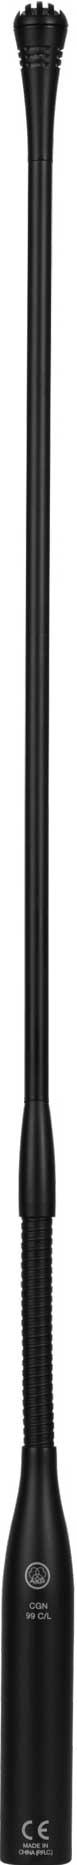 "AKG CGN99C/L  Gooseneck Microphone, Cardioid, Condenser, 23"" CGN99C/L"